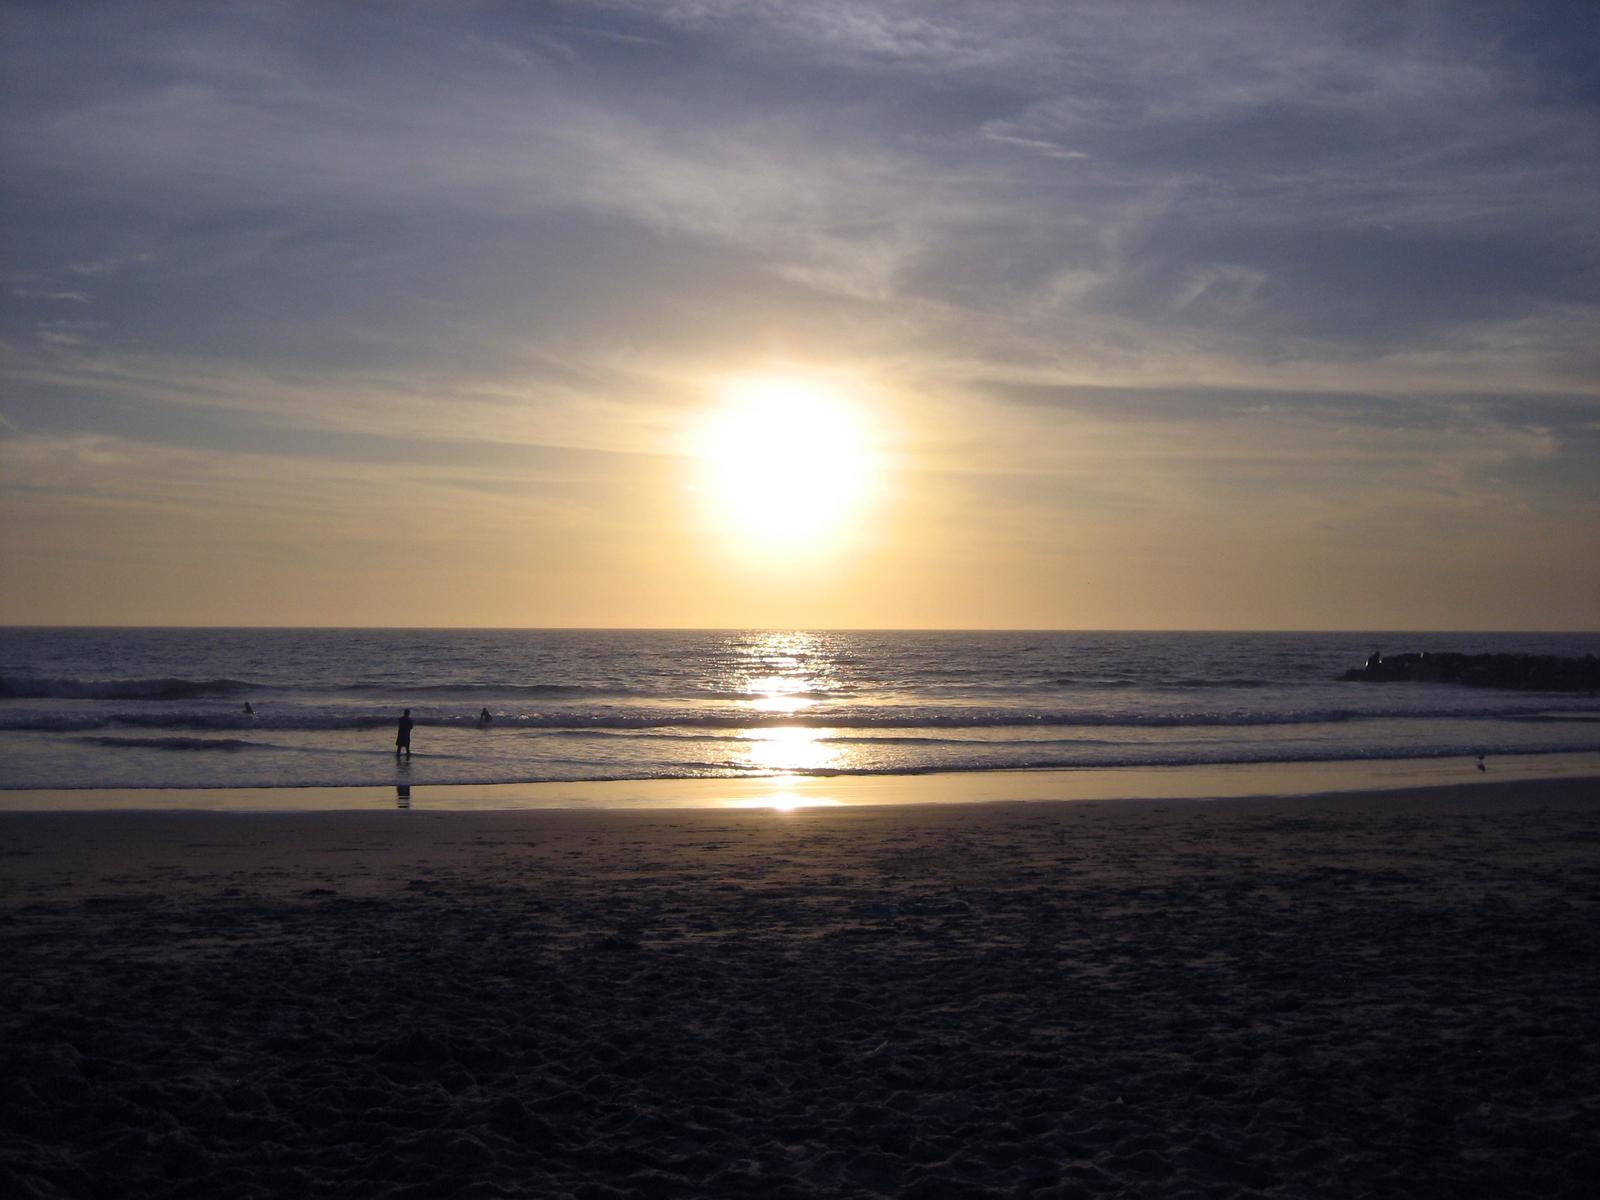 Costal Sunset, Beach, Bspo06, California, Coast, HQ Photo